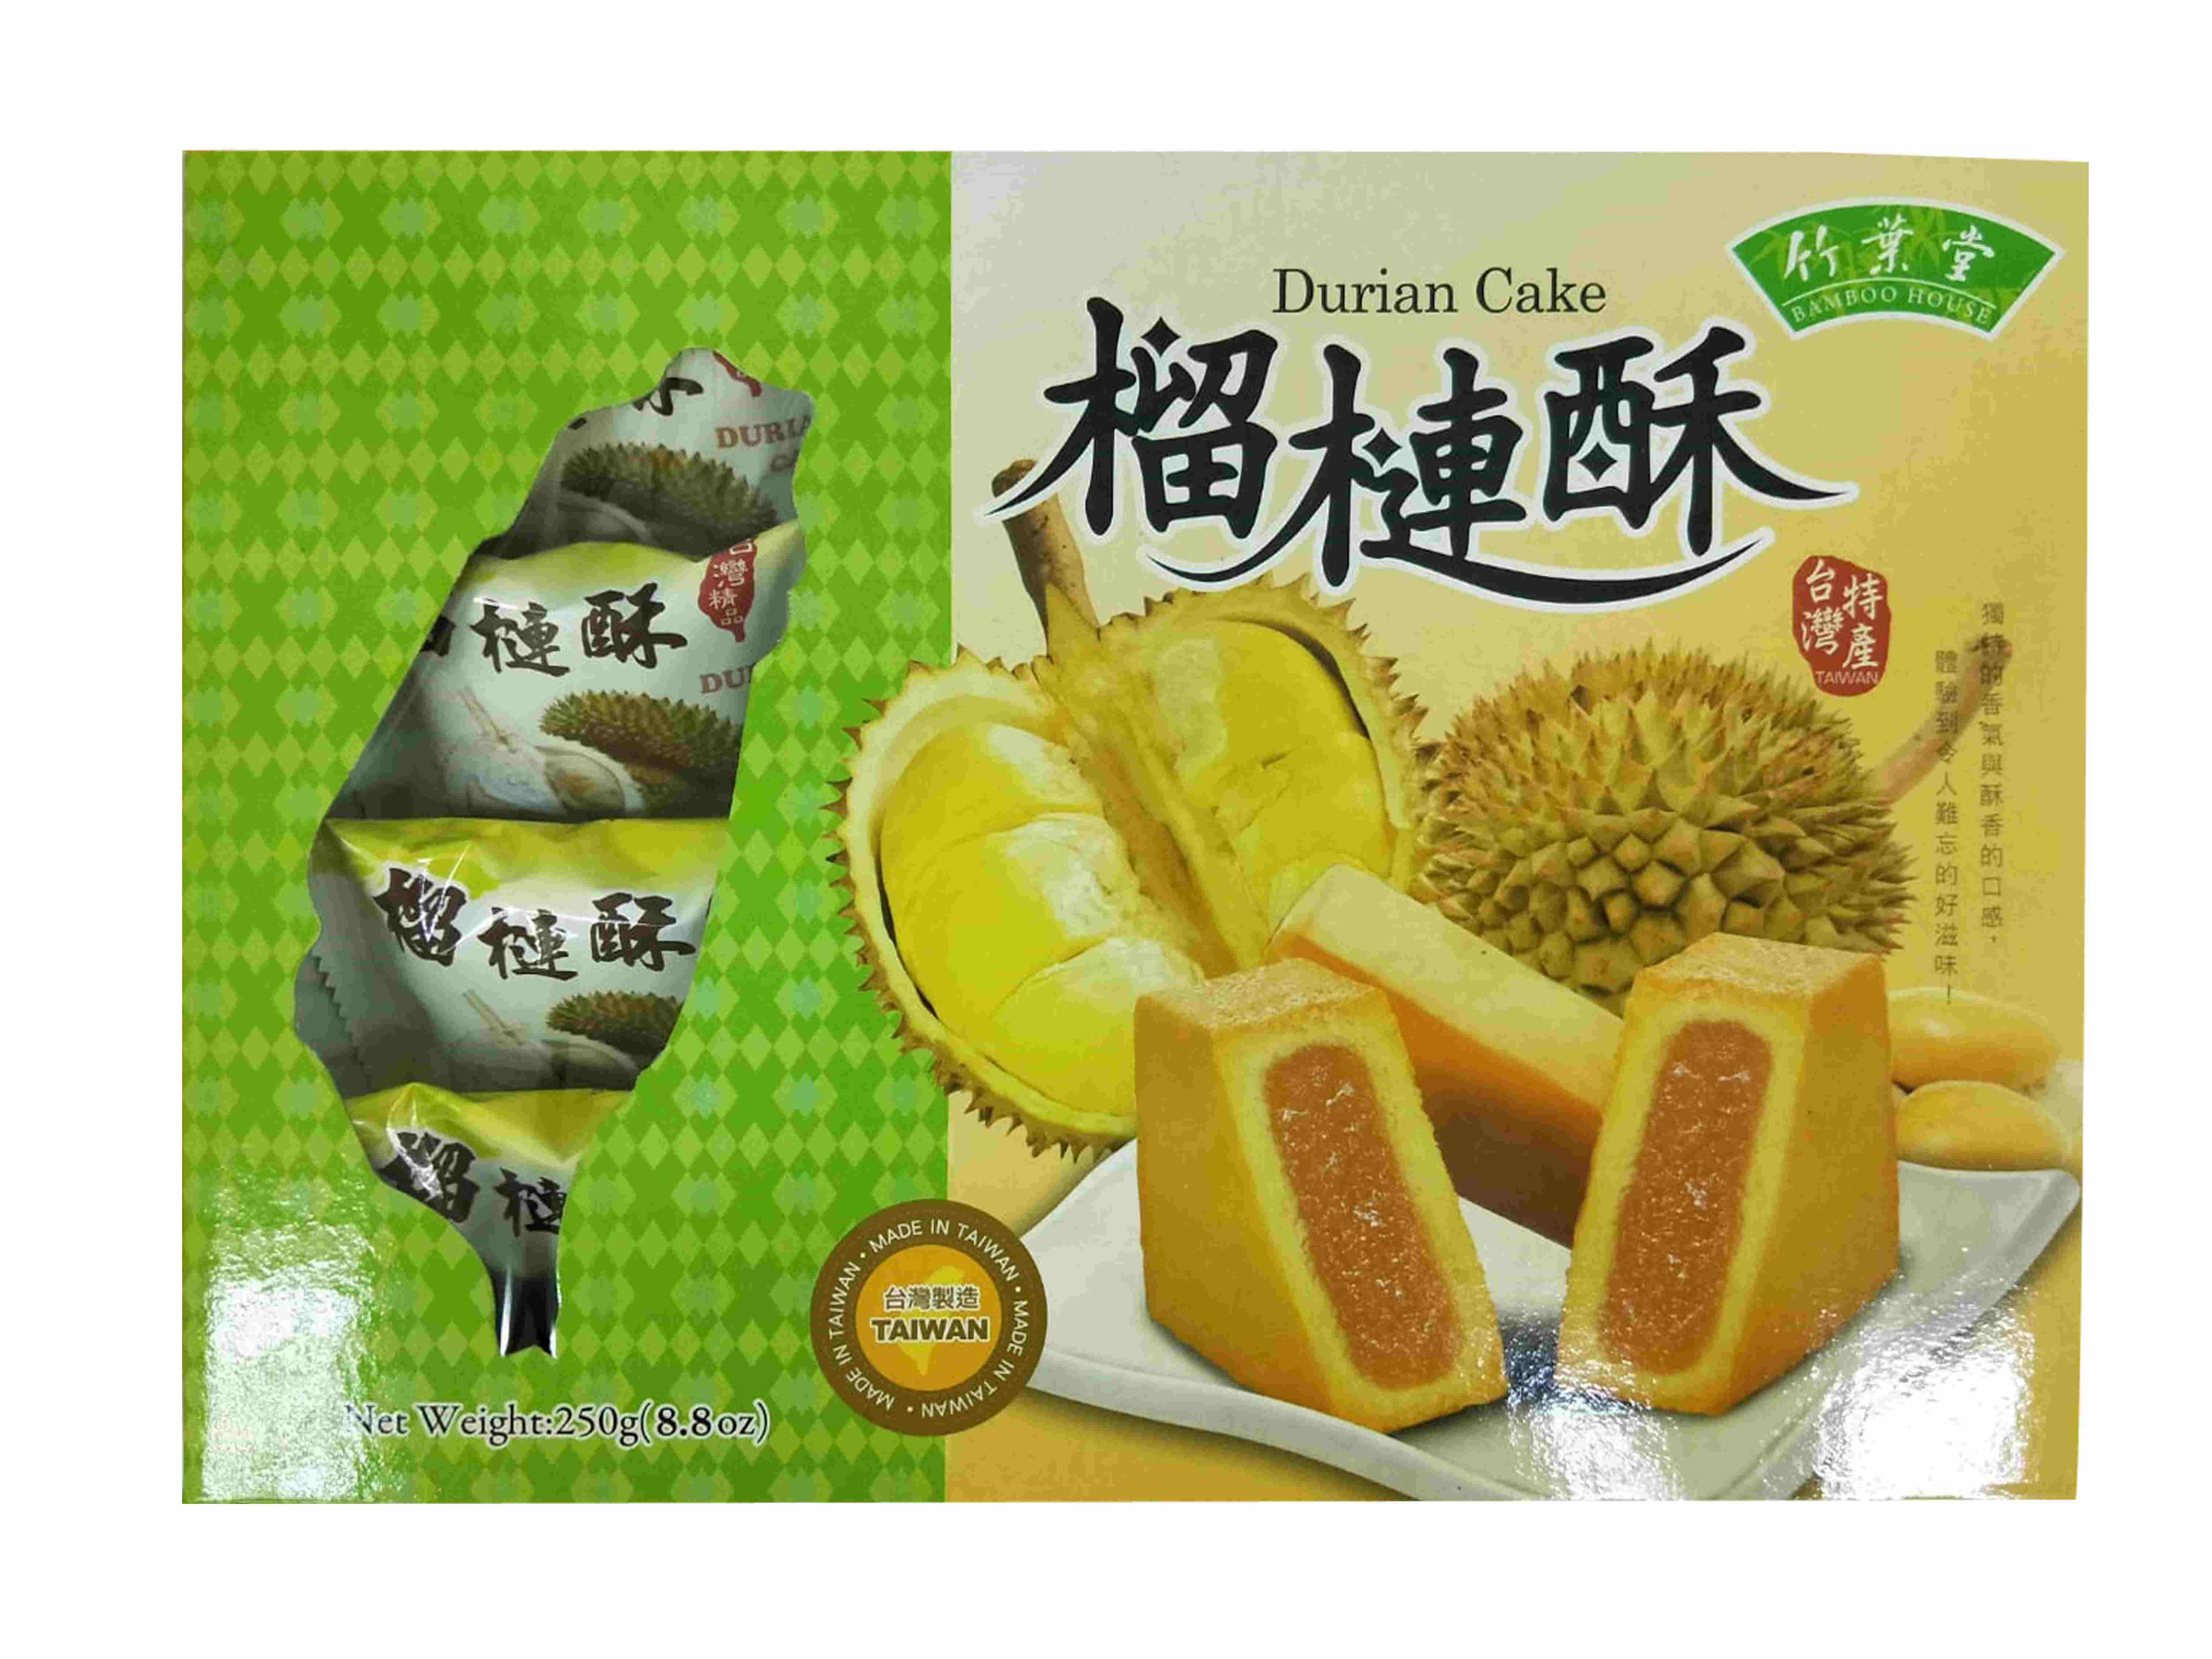 Image Durian Cake 竹叶堂-榴莲酥 250grams